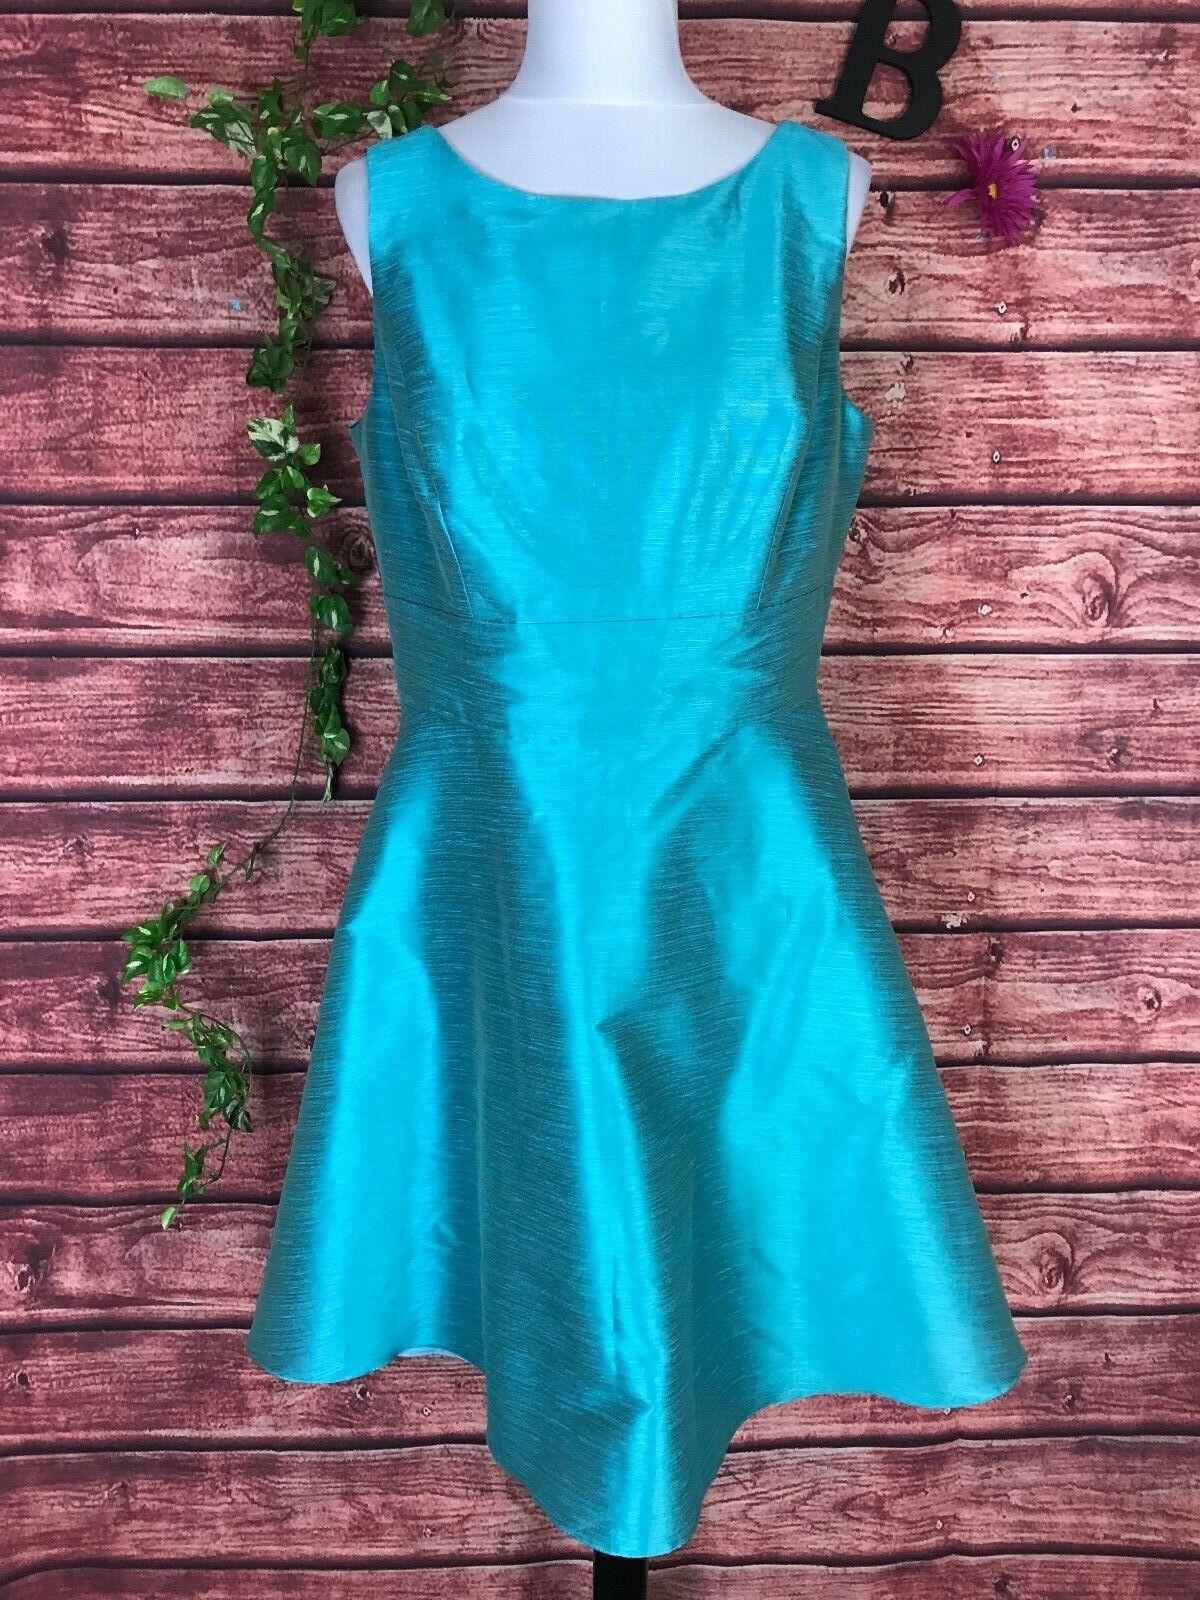 Alfrot Sung Dress Gown 16 Aquamarine Blau Grün Dupioni Wedding Formal Evening